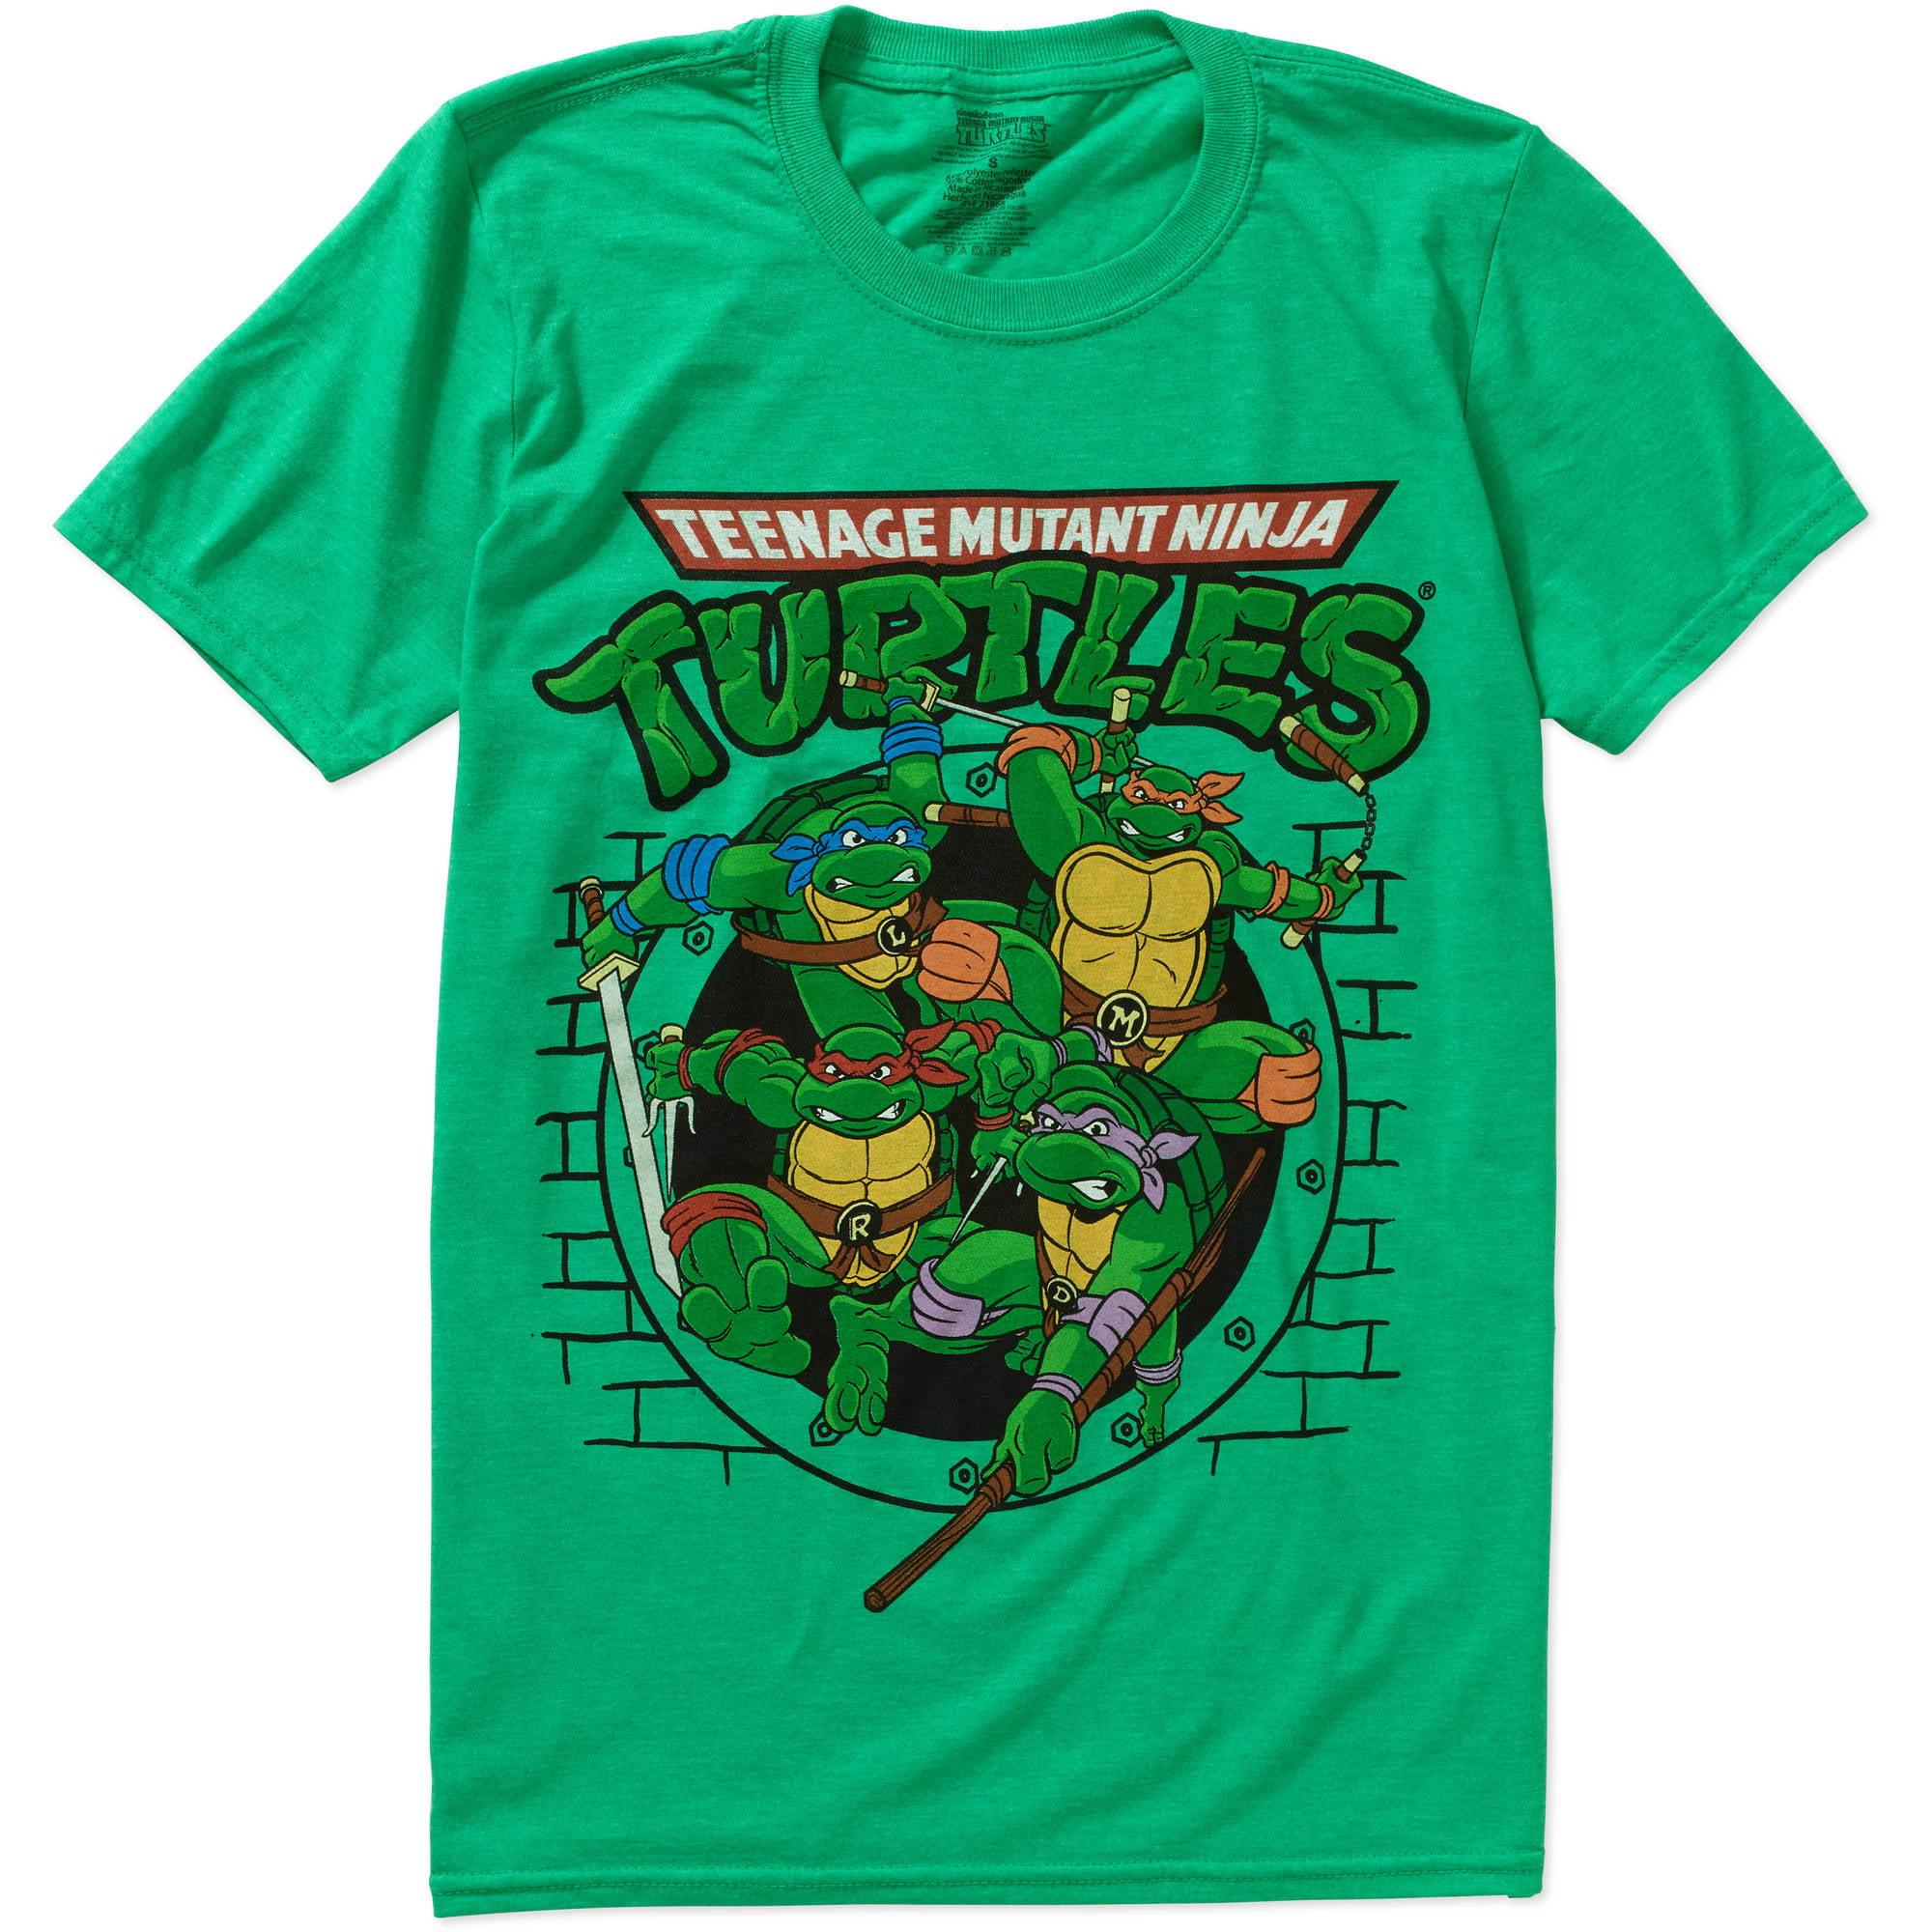 Teenage Mutant Ninja Turtles Vintage Sewer Big Men's Graphic Short Sleeve Tee